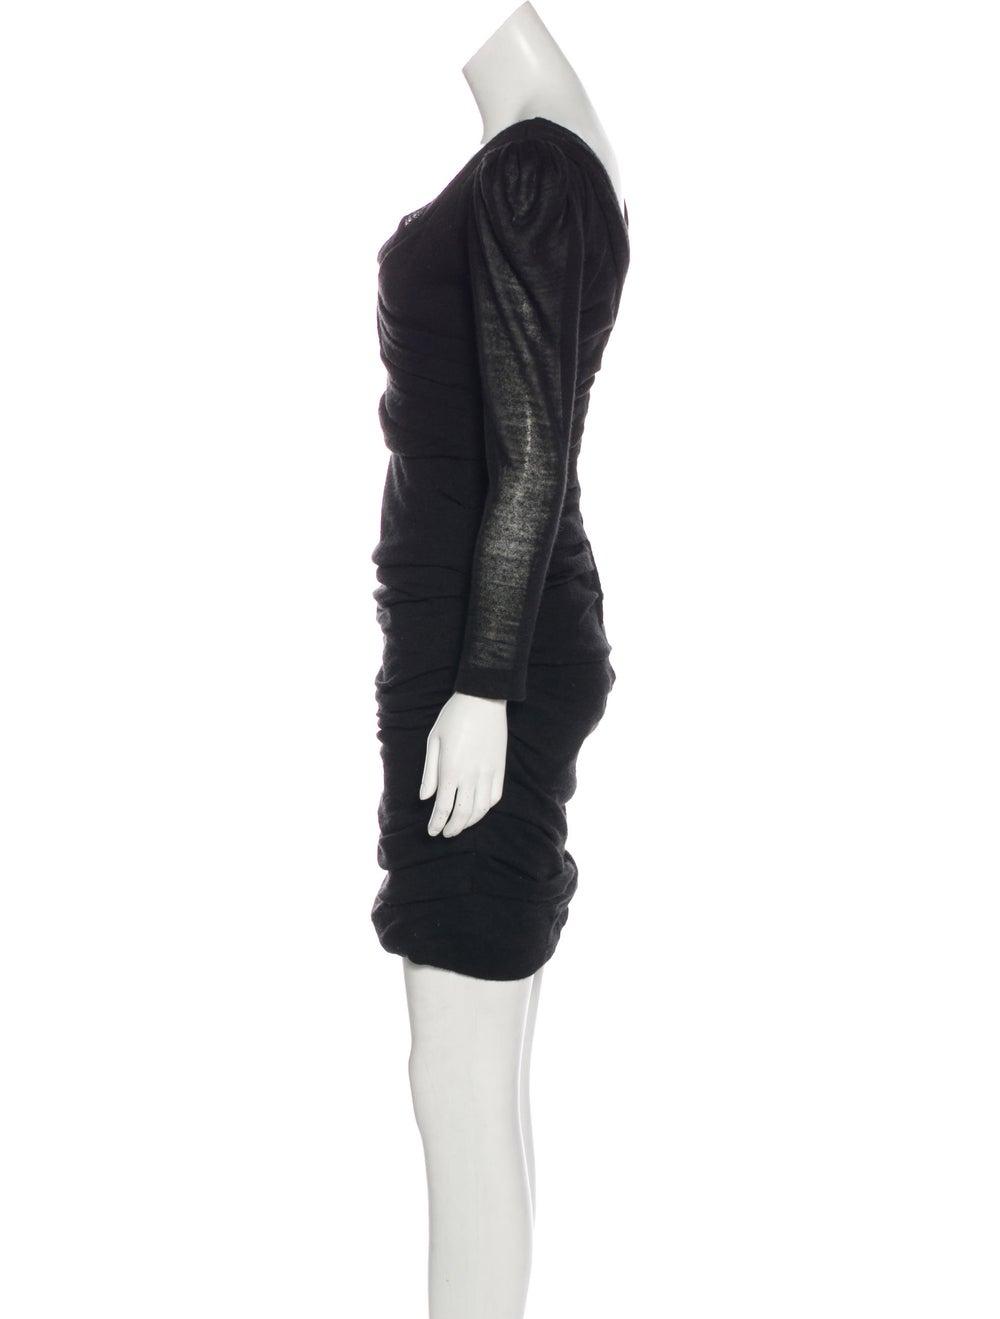 Dolce & Gabbana Long Sleeve Sweater Dress Black - image 2